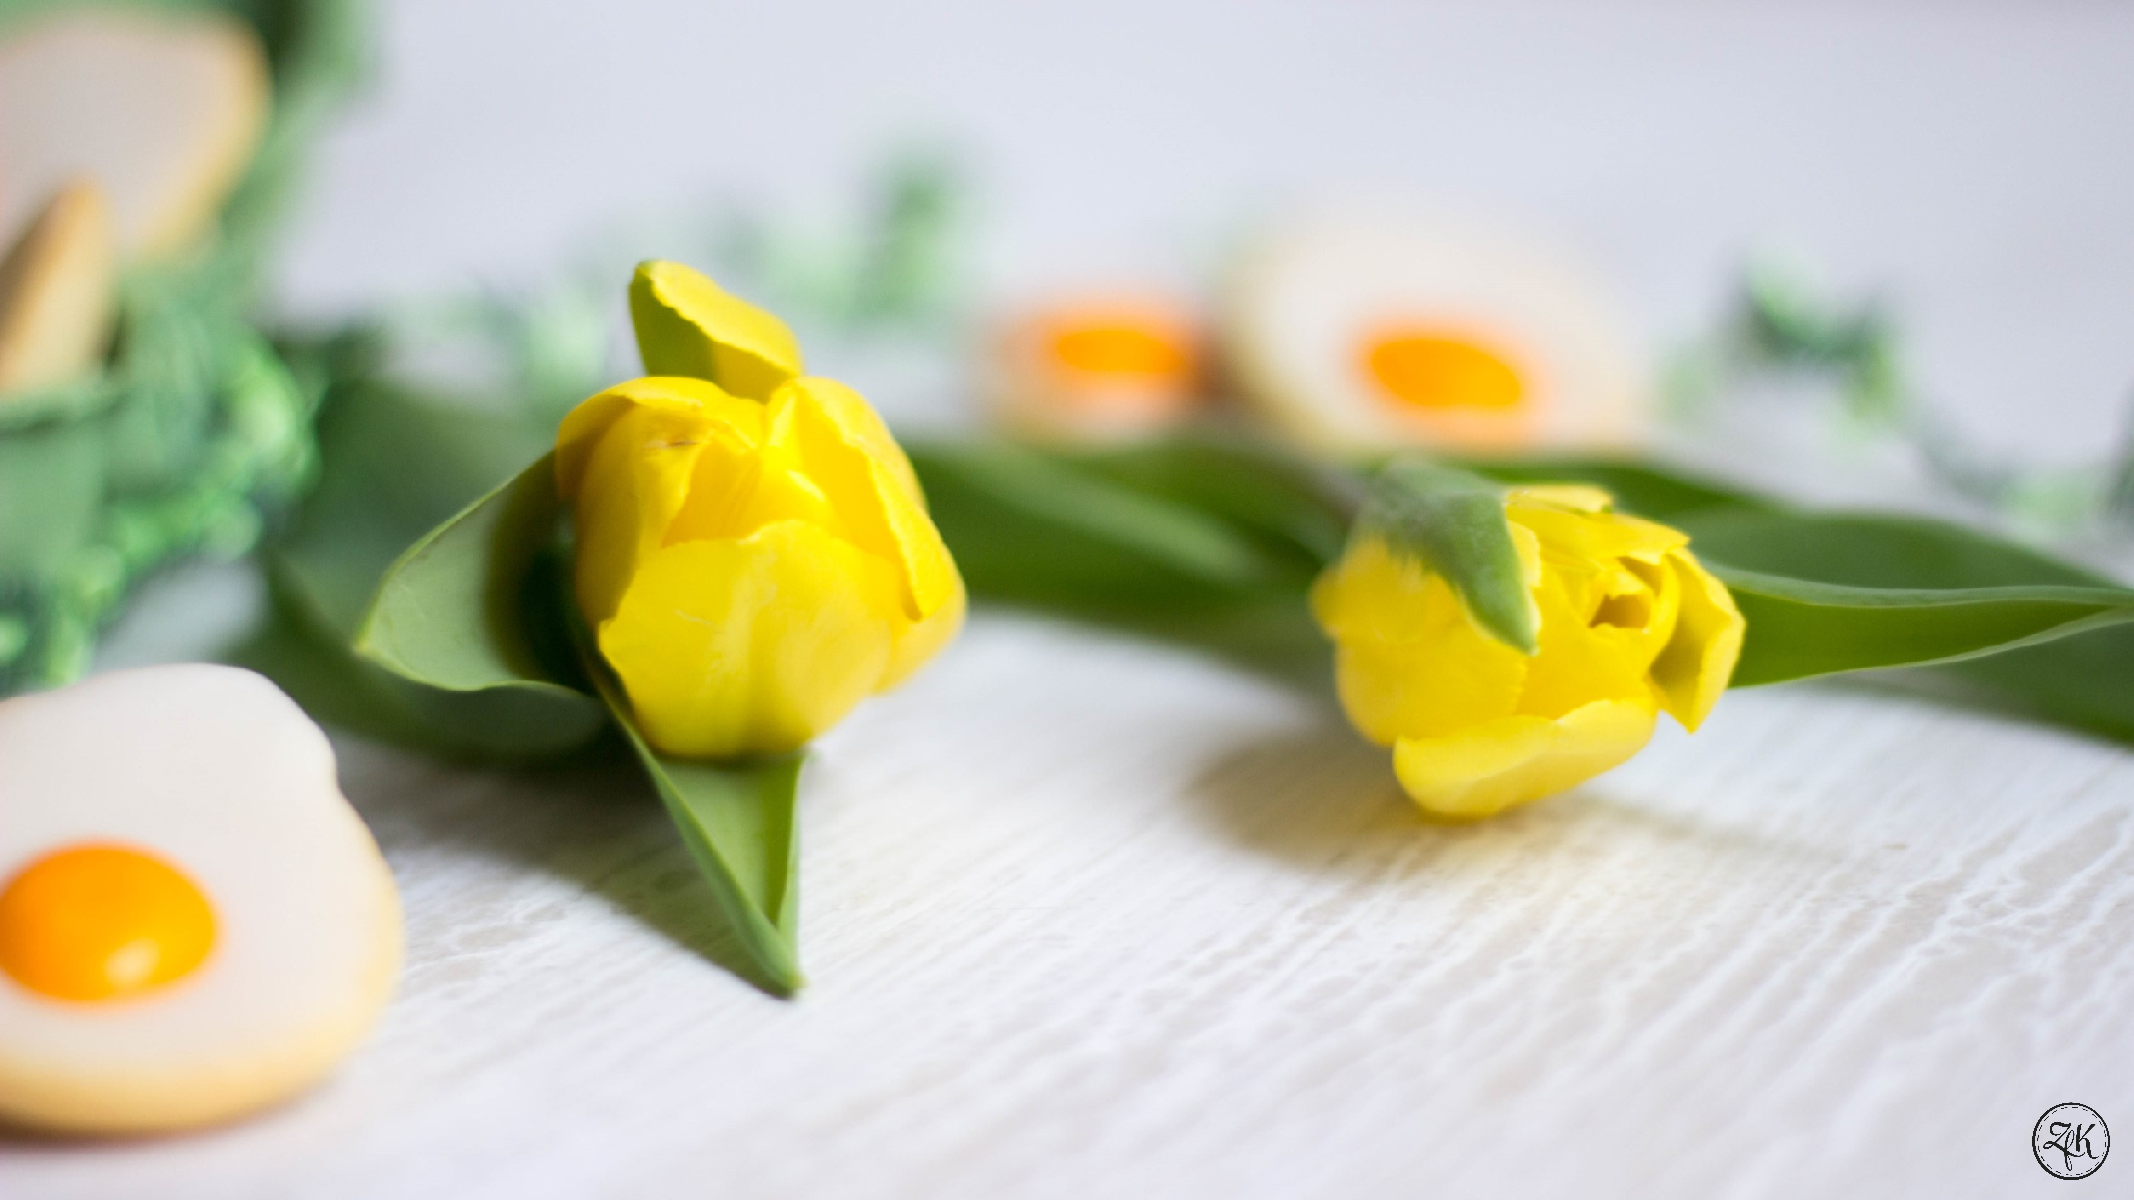 Willkommen Frühling!